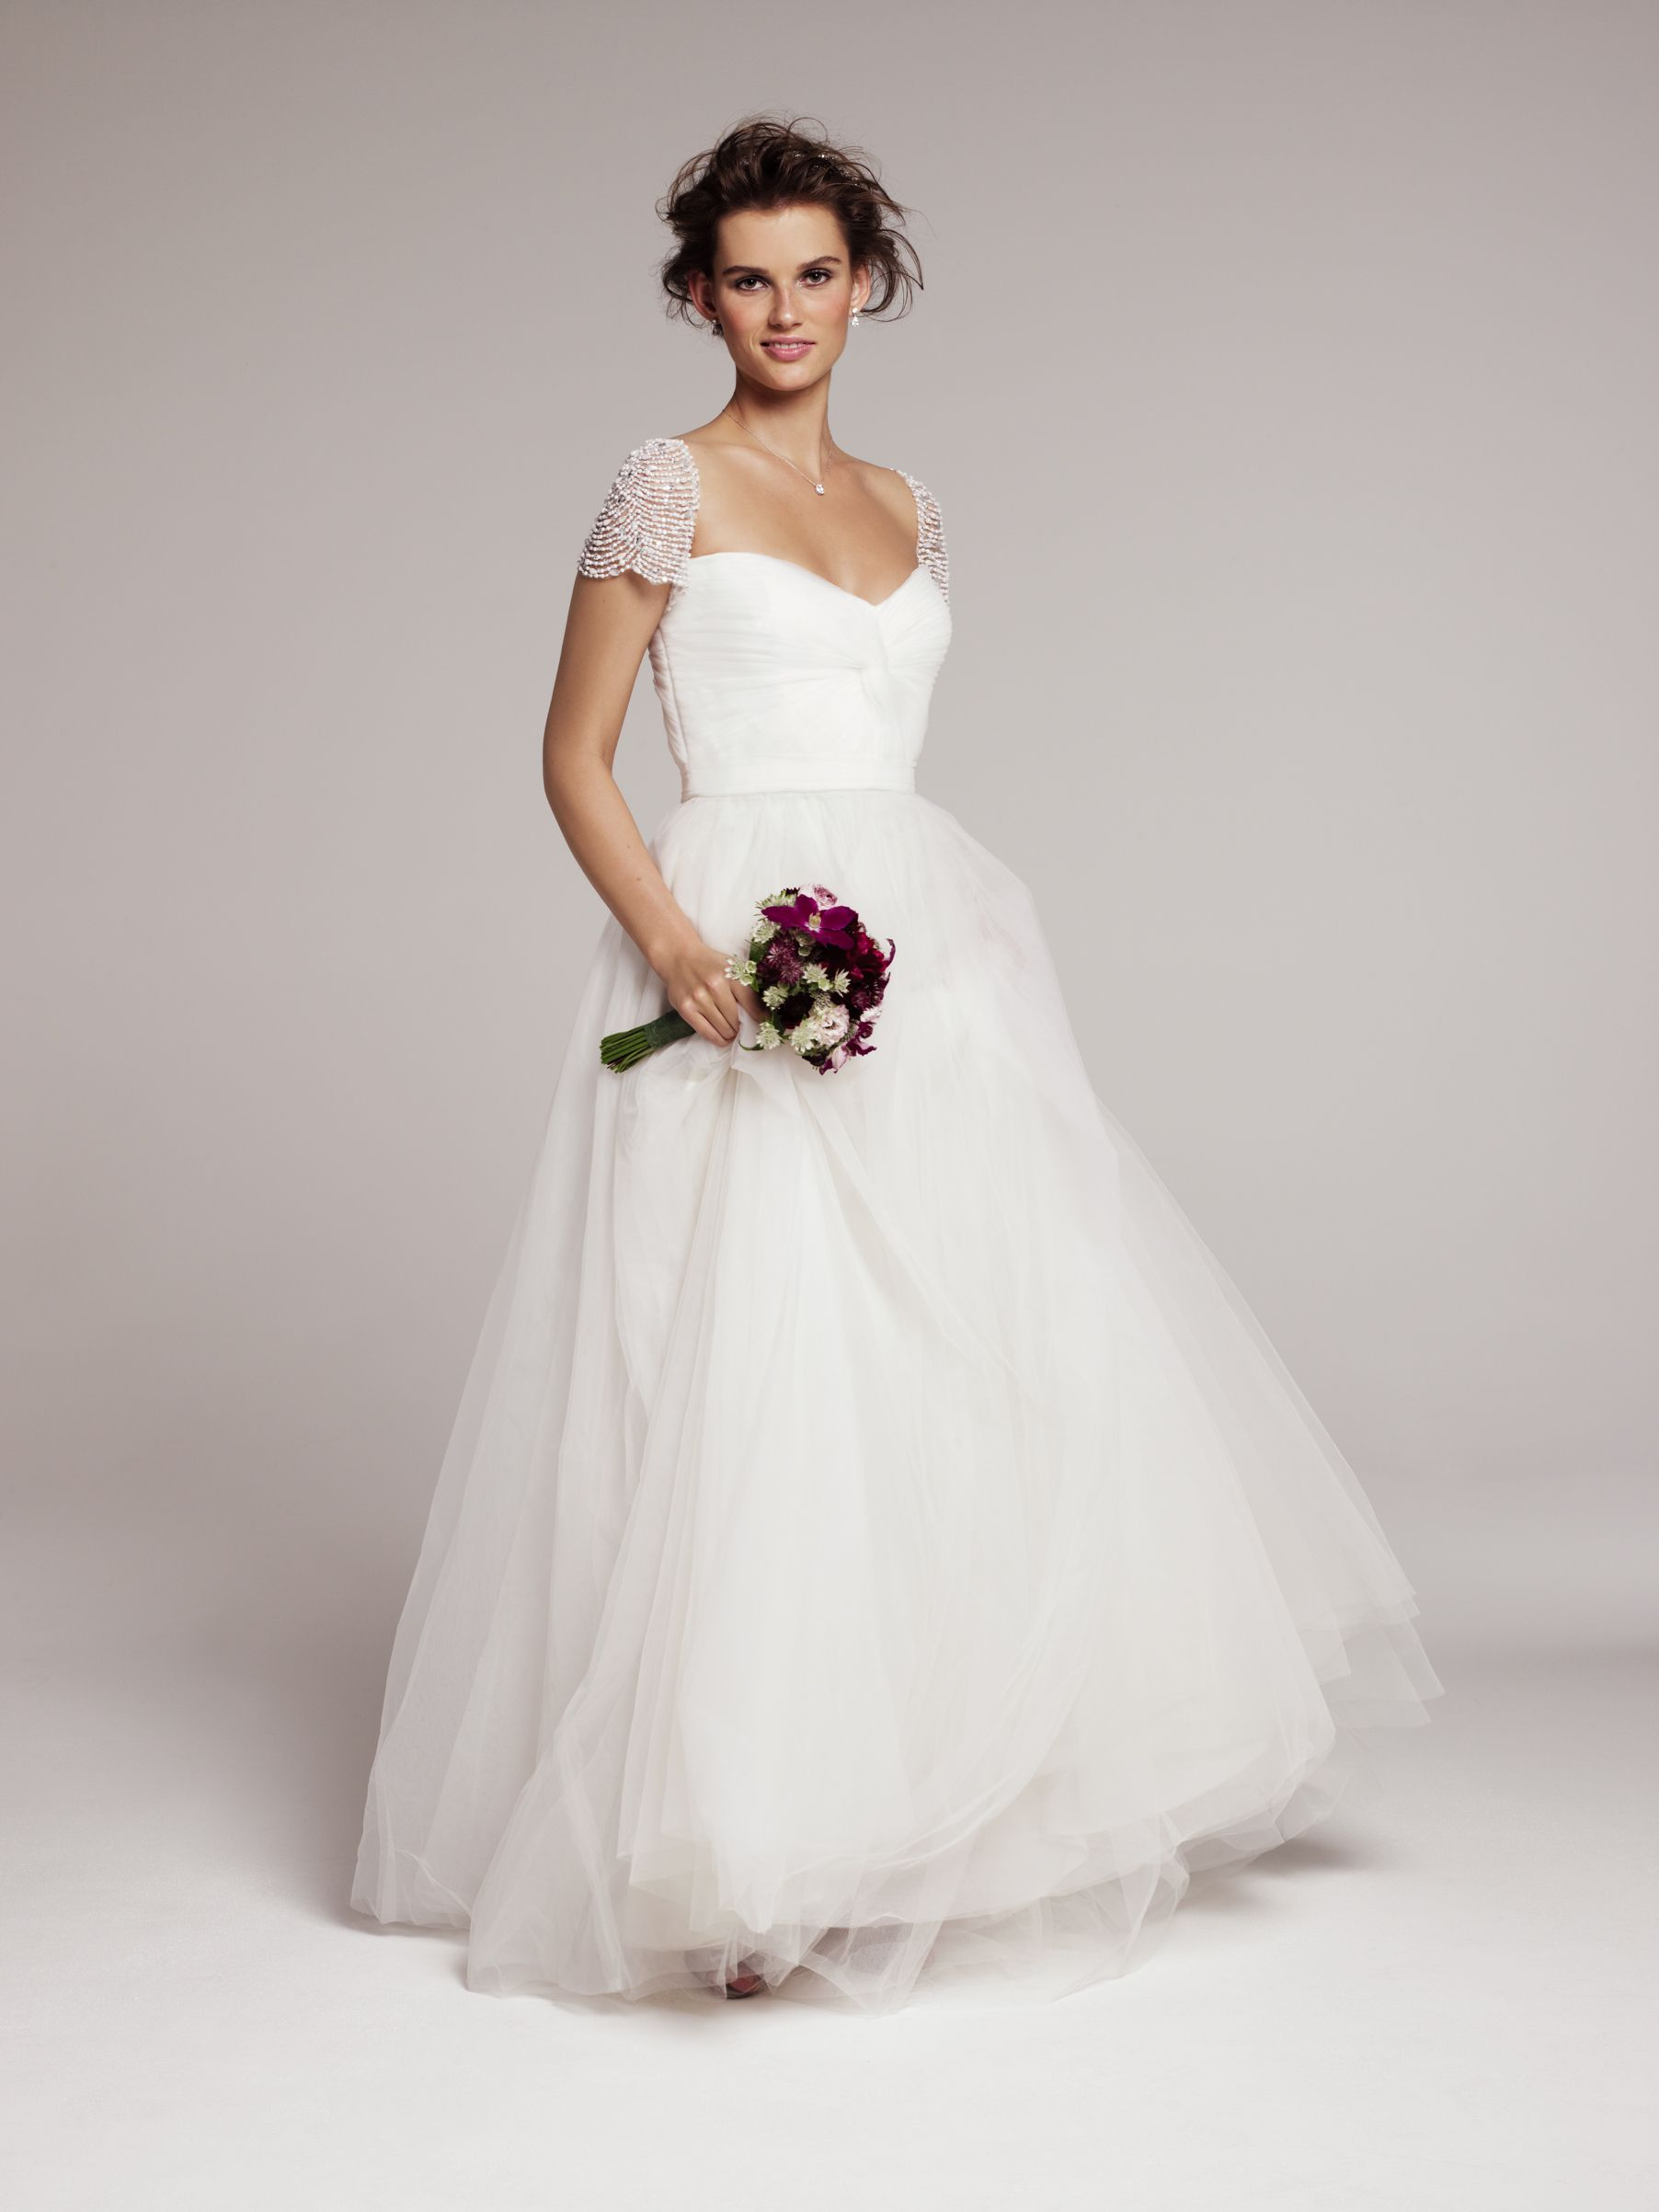 Roses by Reem Acra - \'Laurel\' gown at Nordstrom Wedding Suites ...